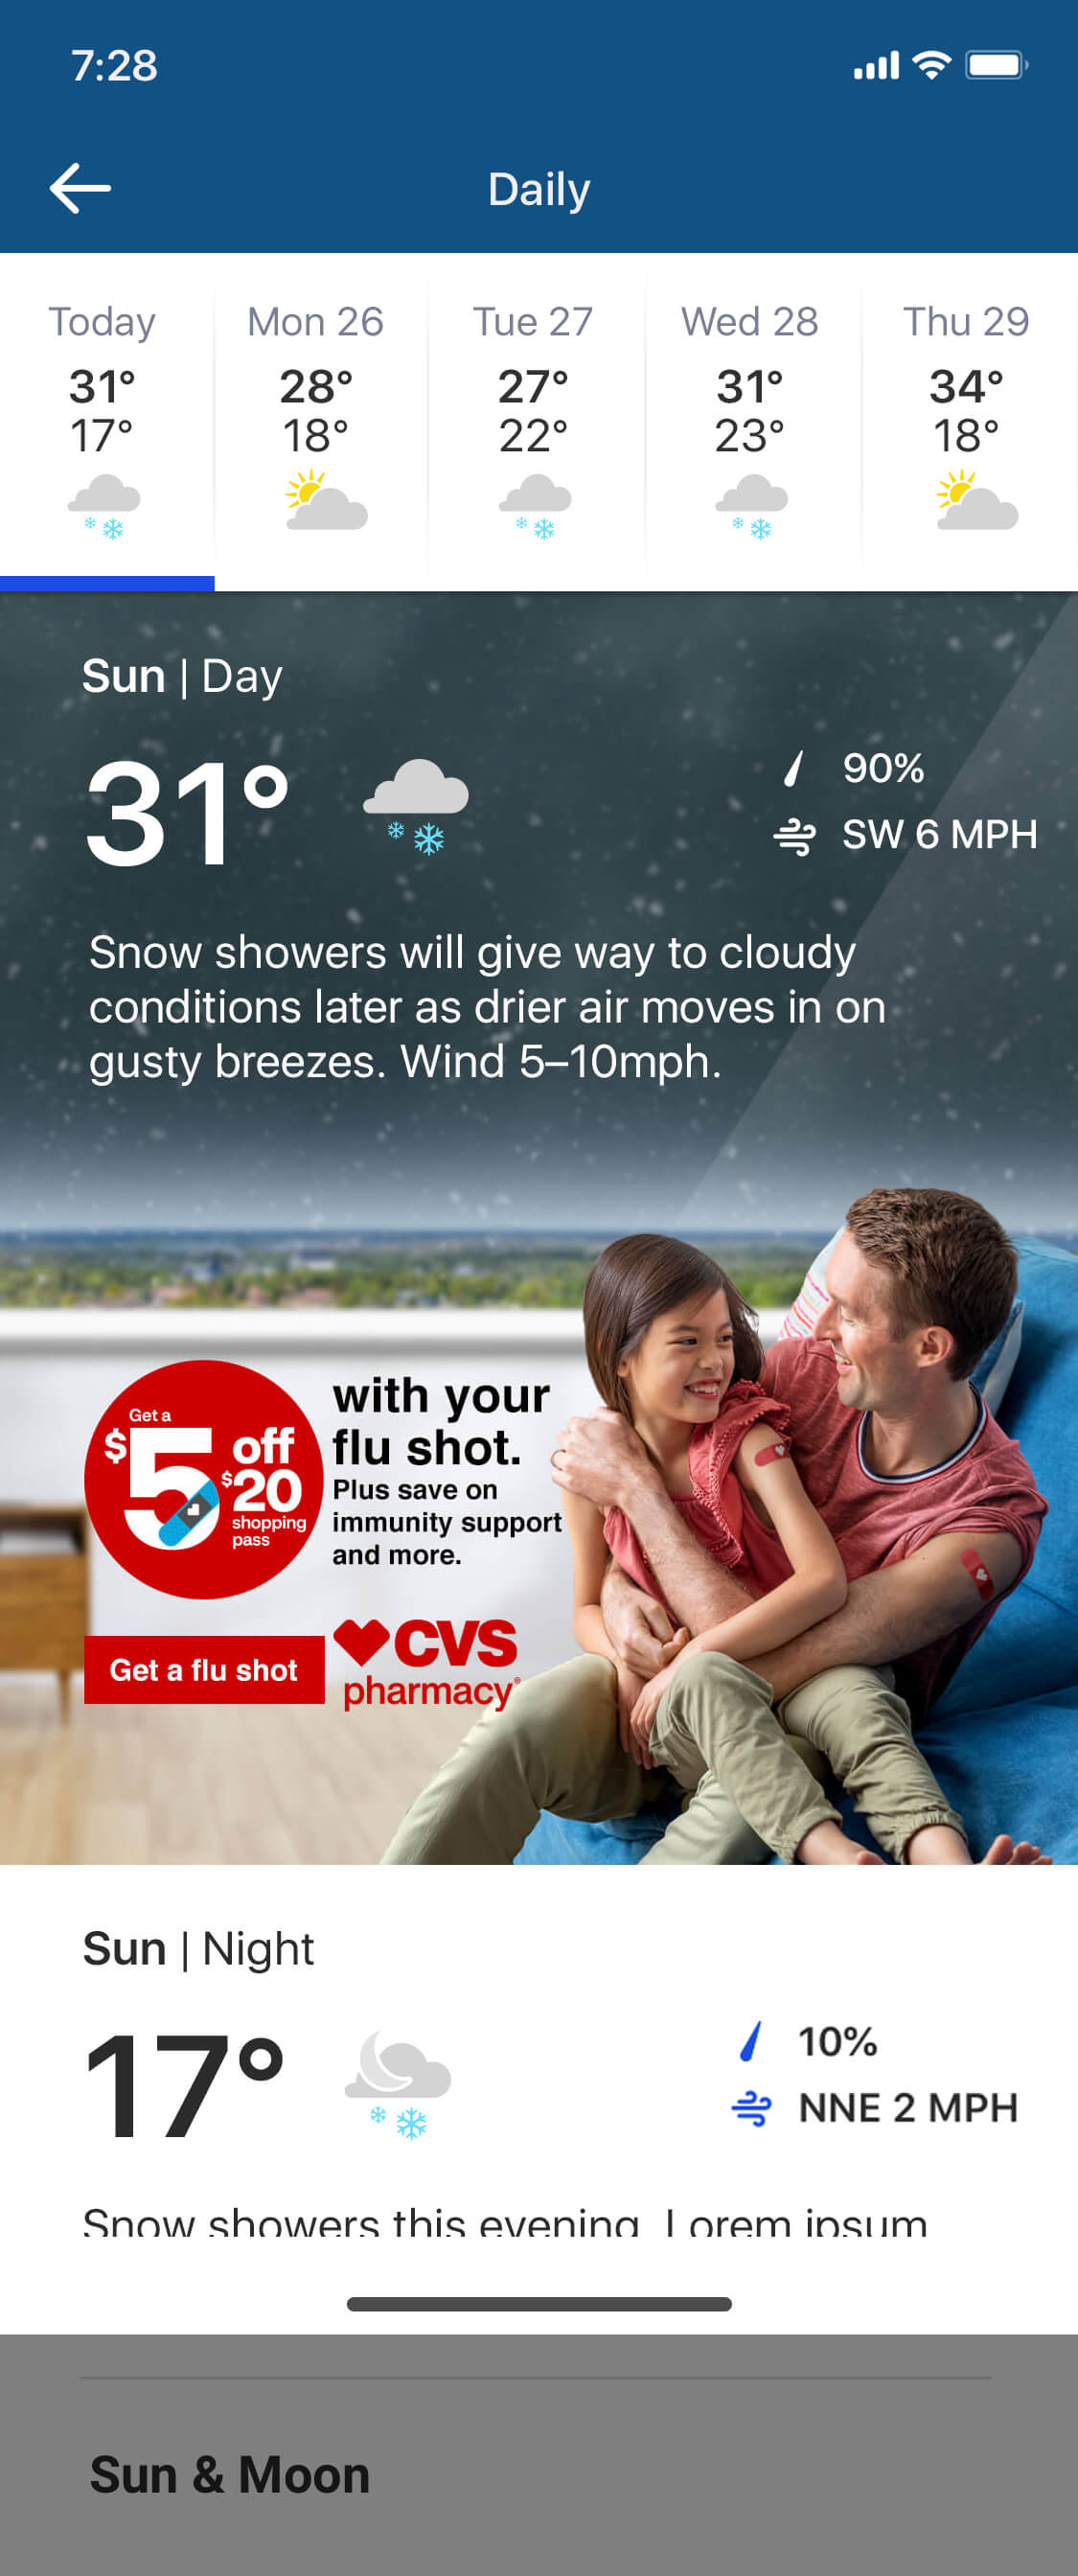 CVS - IDD-week_ahead-snow-d